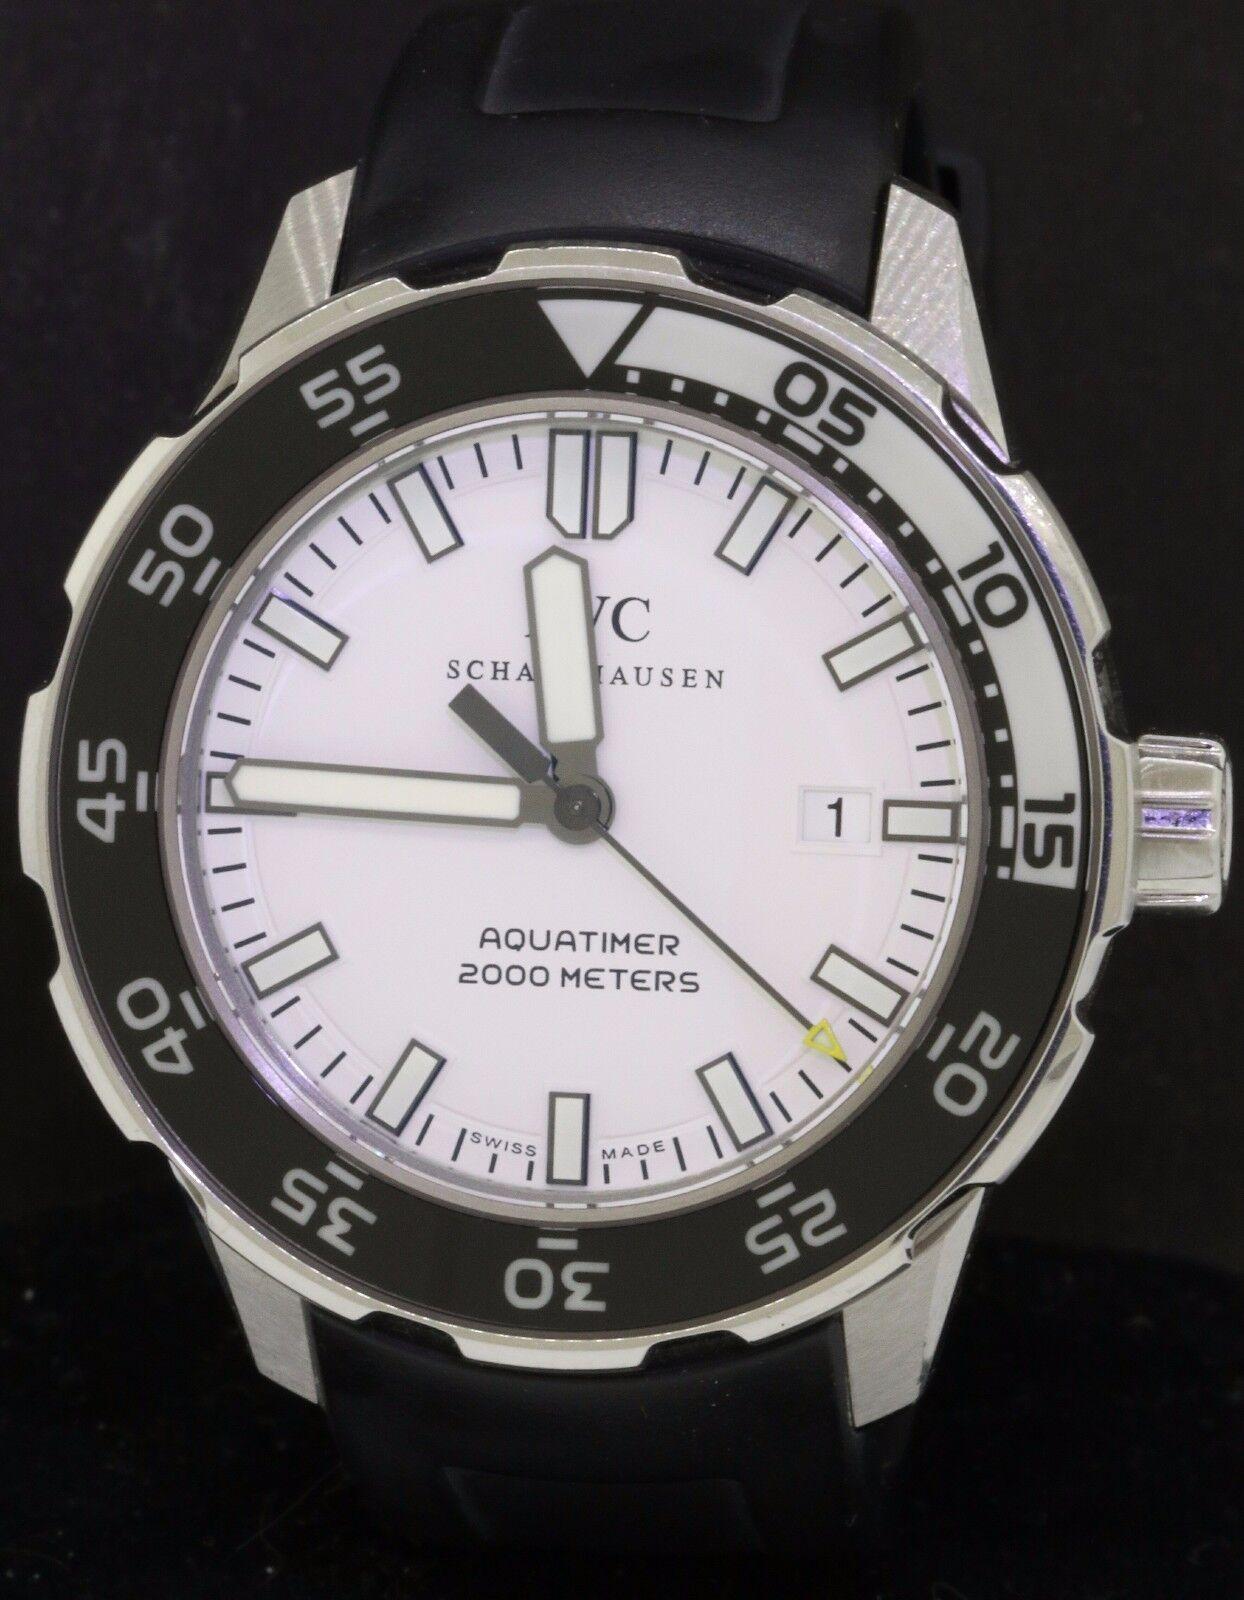 IWC Aquatimer Schaffhausen 2000m SS 46mm auto. men's watch w/ date & white dial - watch picture 1